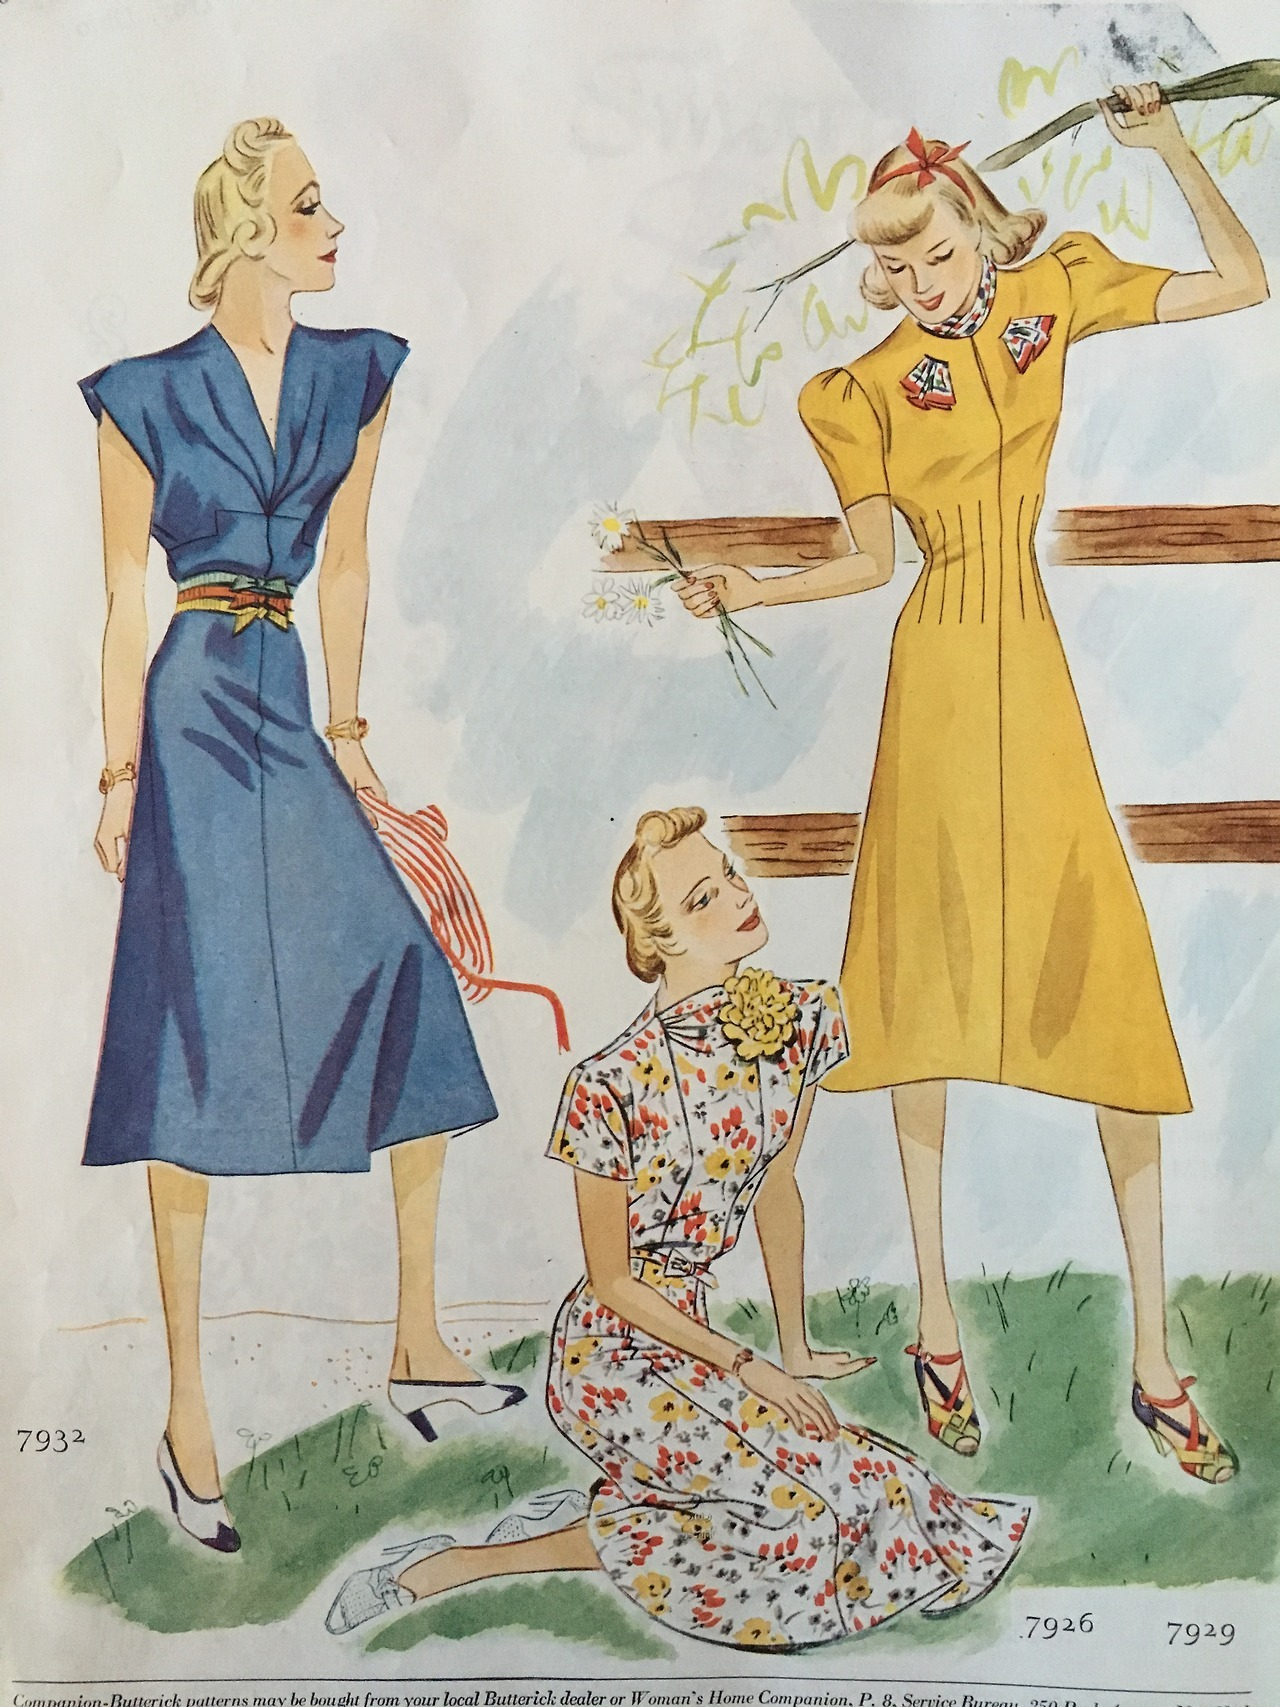 Woman's Home Companion.   June 1938